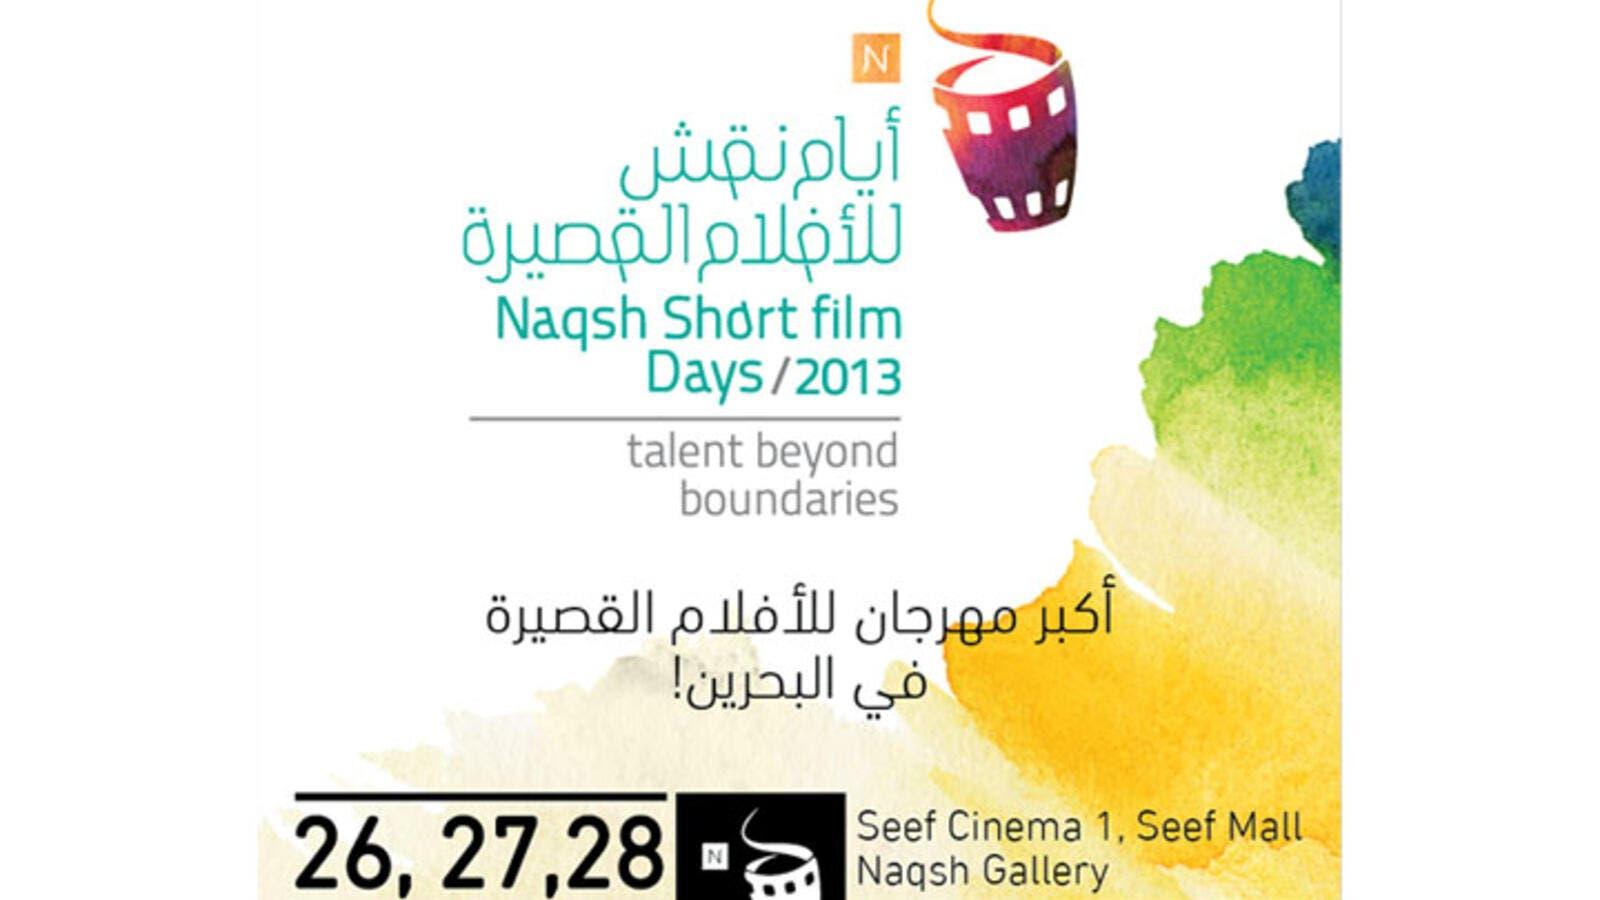 The Naqsh Short Film Days 2013 highlights local artists | Al Bawaba